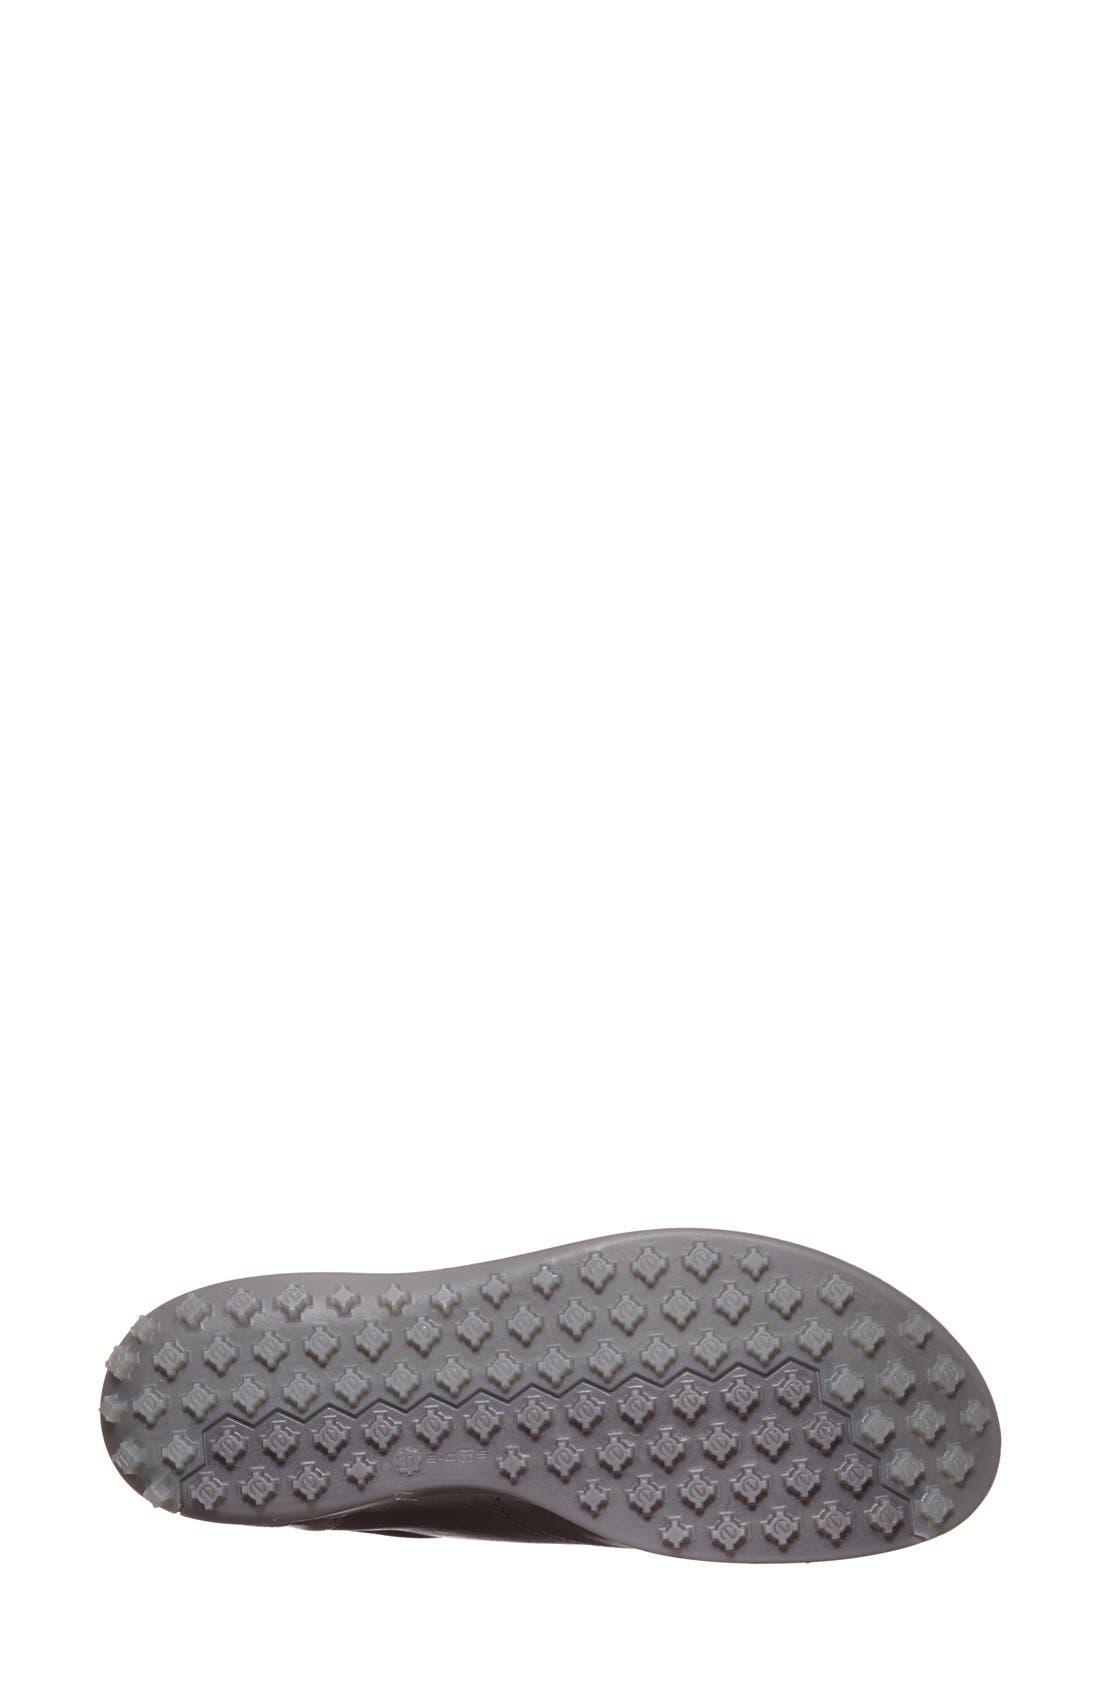 'BIOM' Hydromax<sup>®</sup> Waterproof Golf Shoe,                             Alternate thumbnail 9, color,